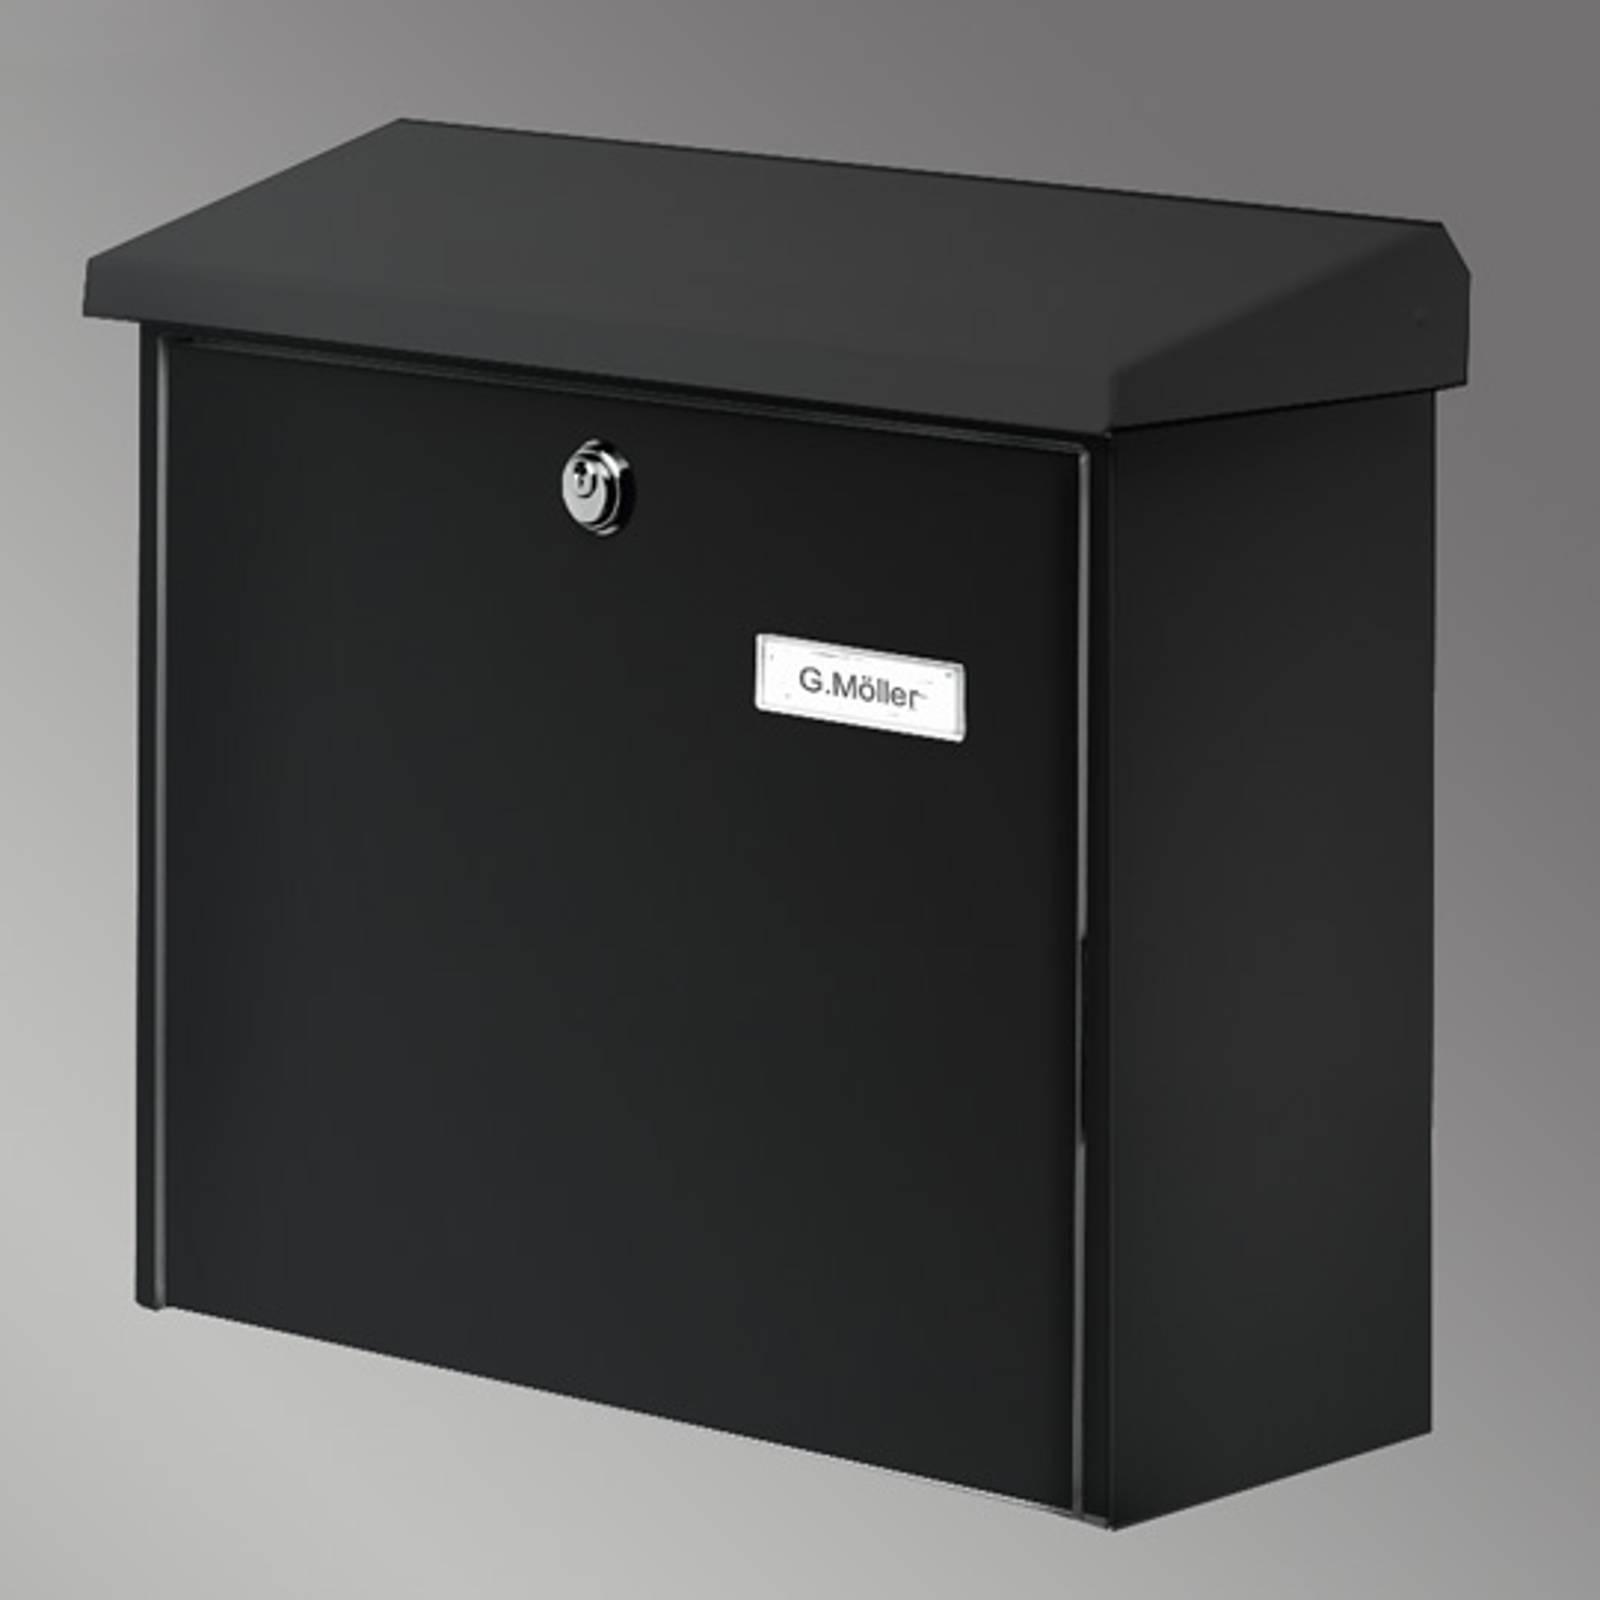 COMFORT letter box, black